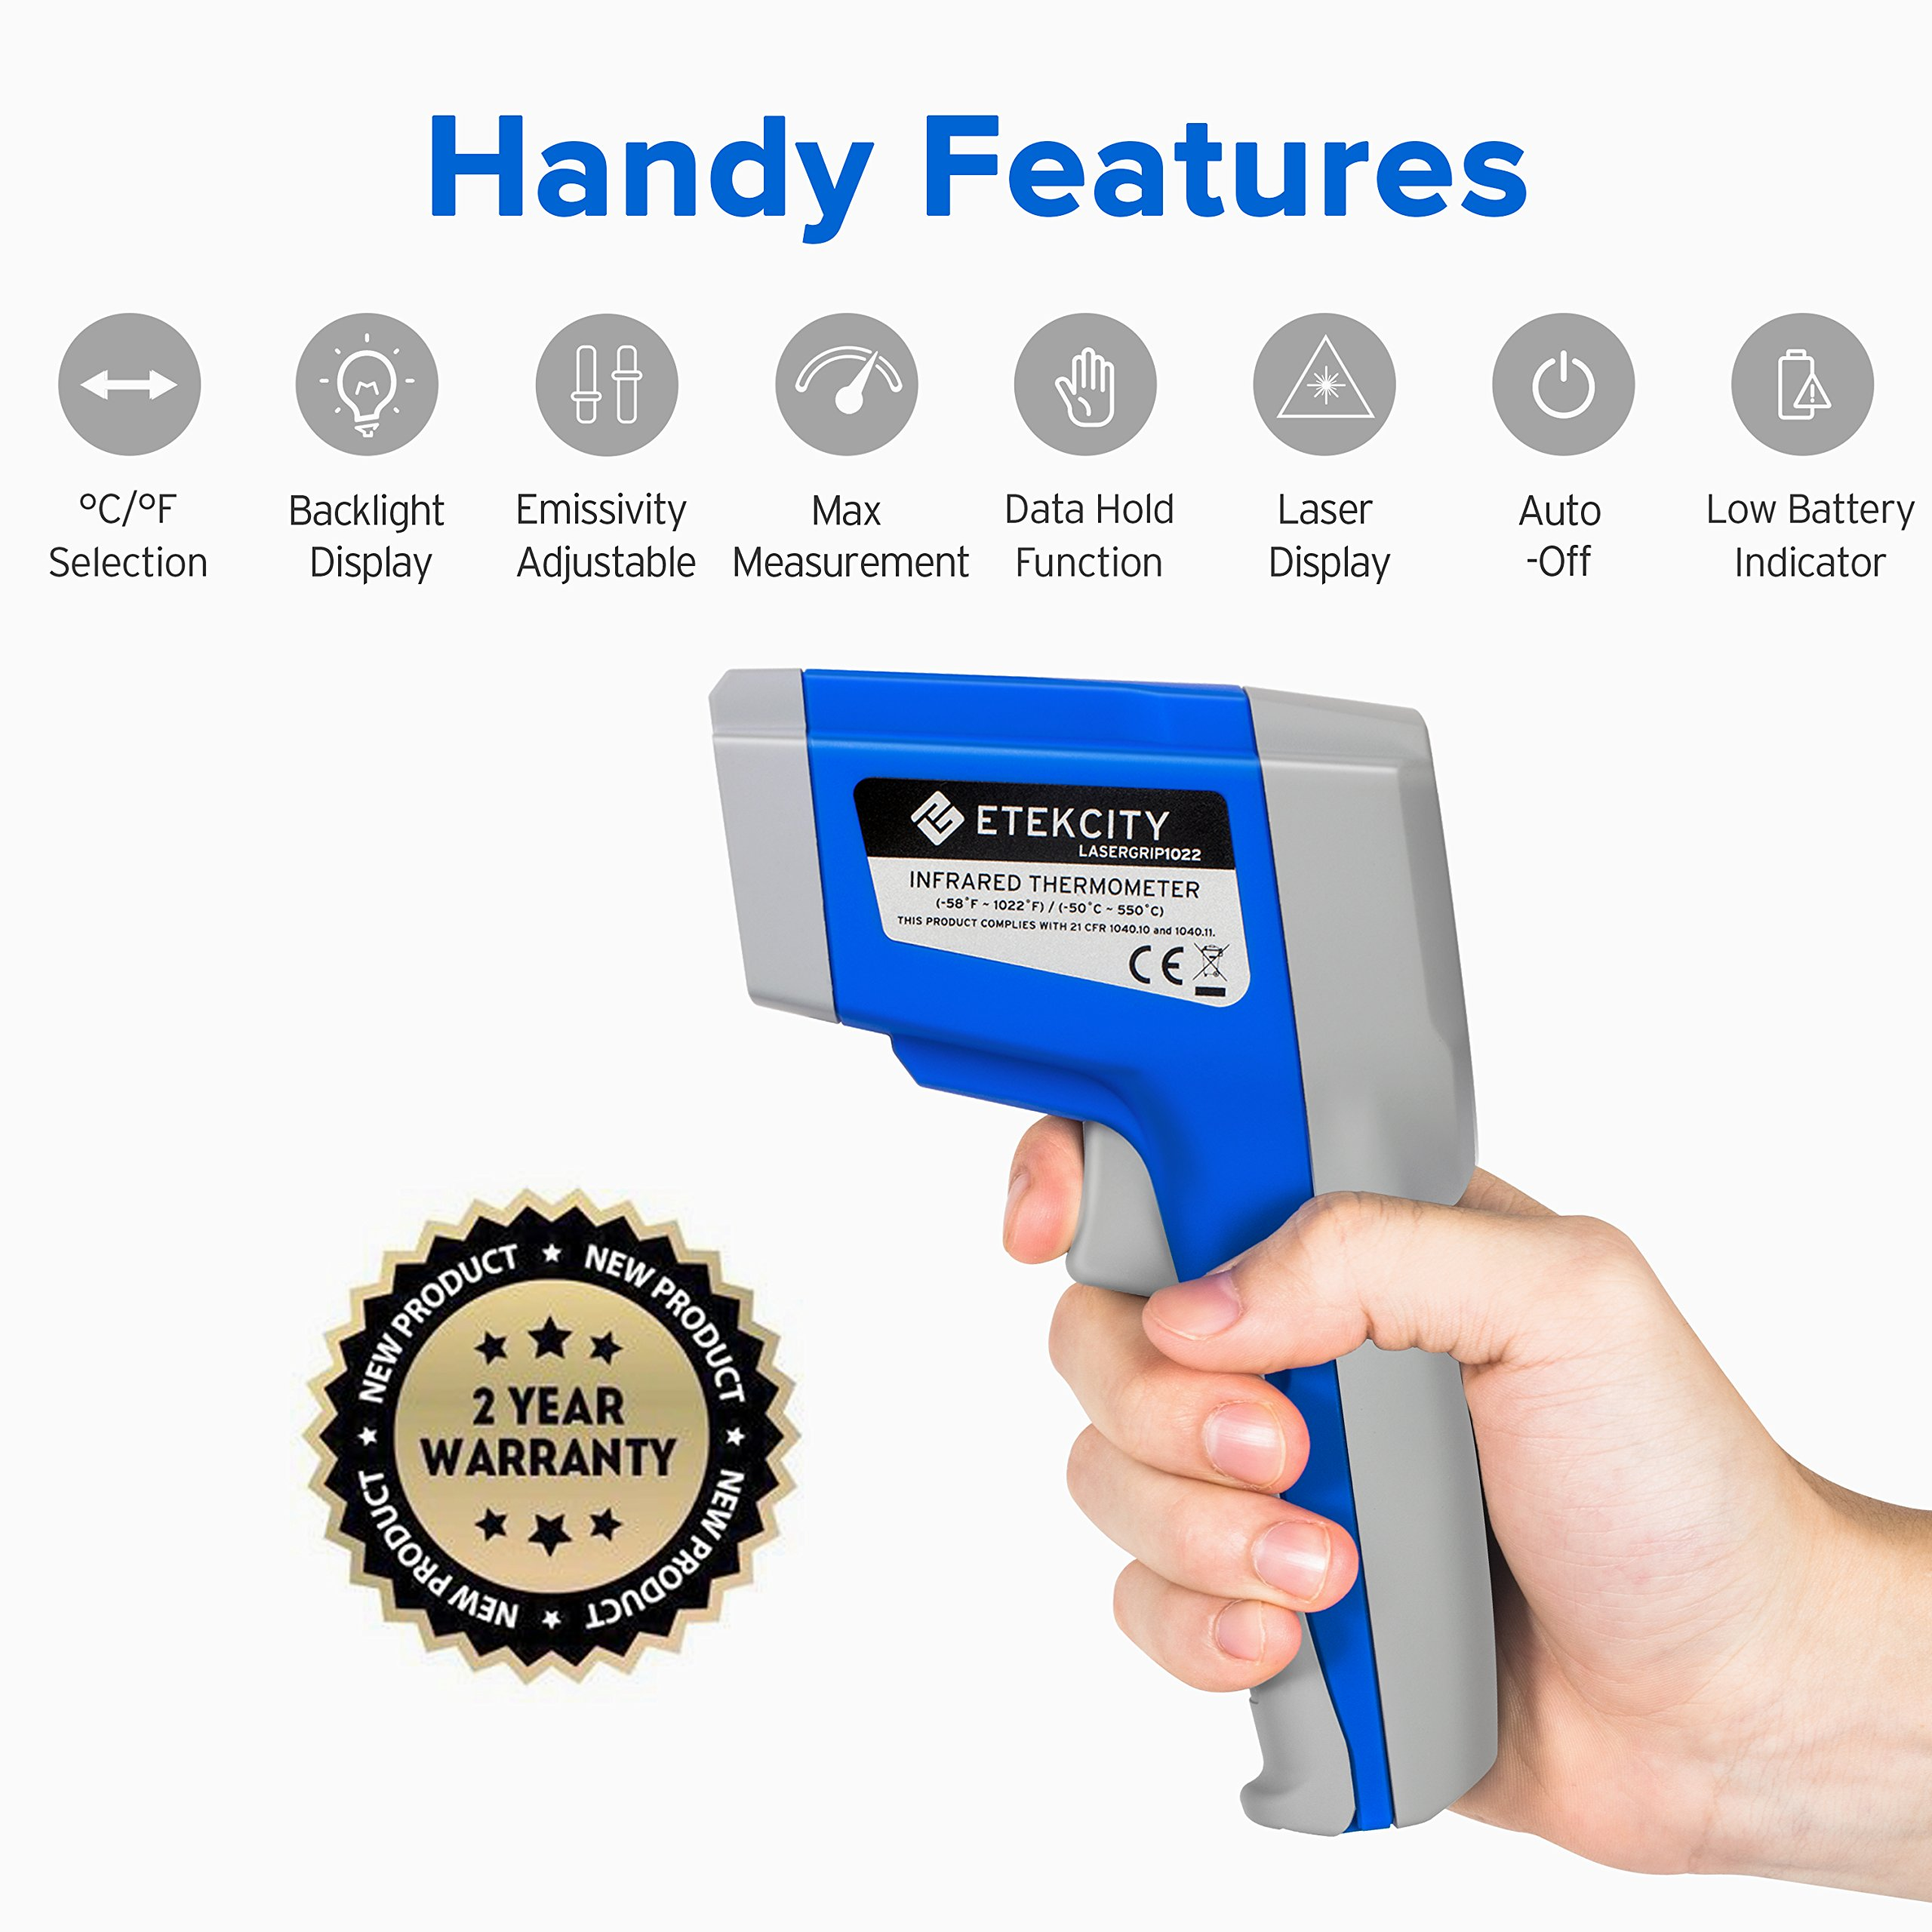 Etekcity 1022 Digital Laser Infrared Thermometer Temperature Gun  Non-contact -58℉~1022℉ (-50℃ ~ 550℃) with Adjustable Emissivity & Max  Measure